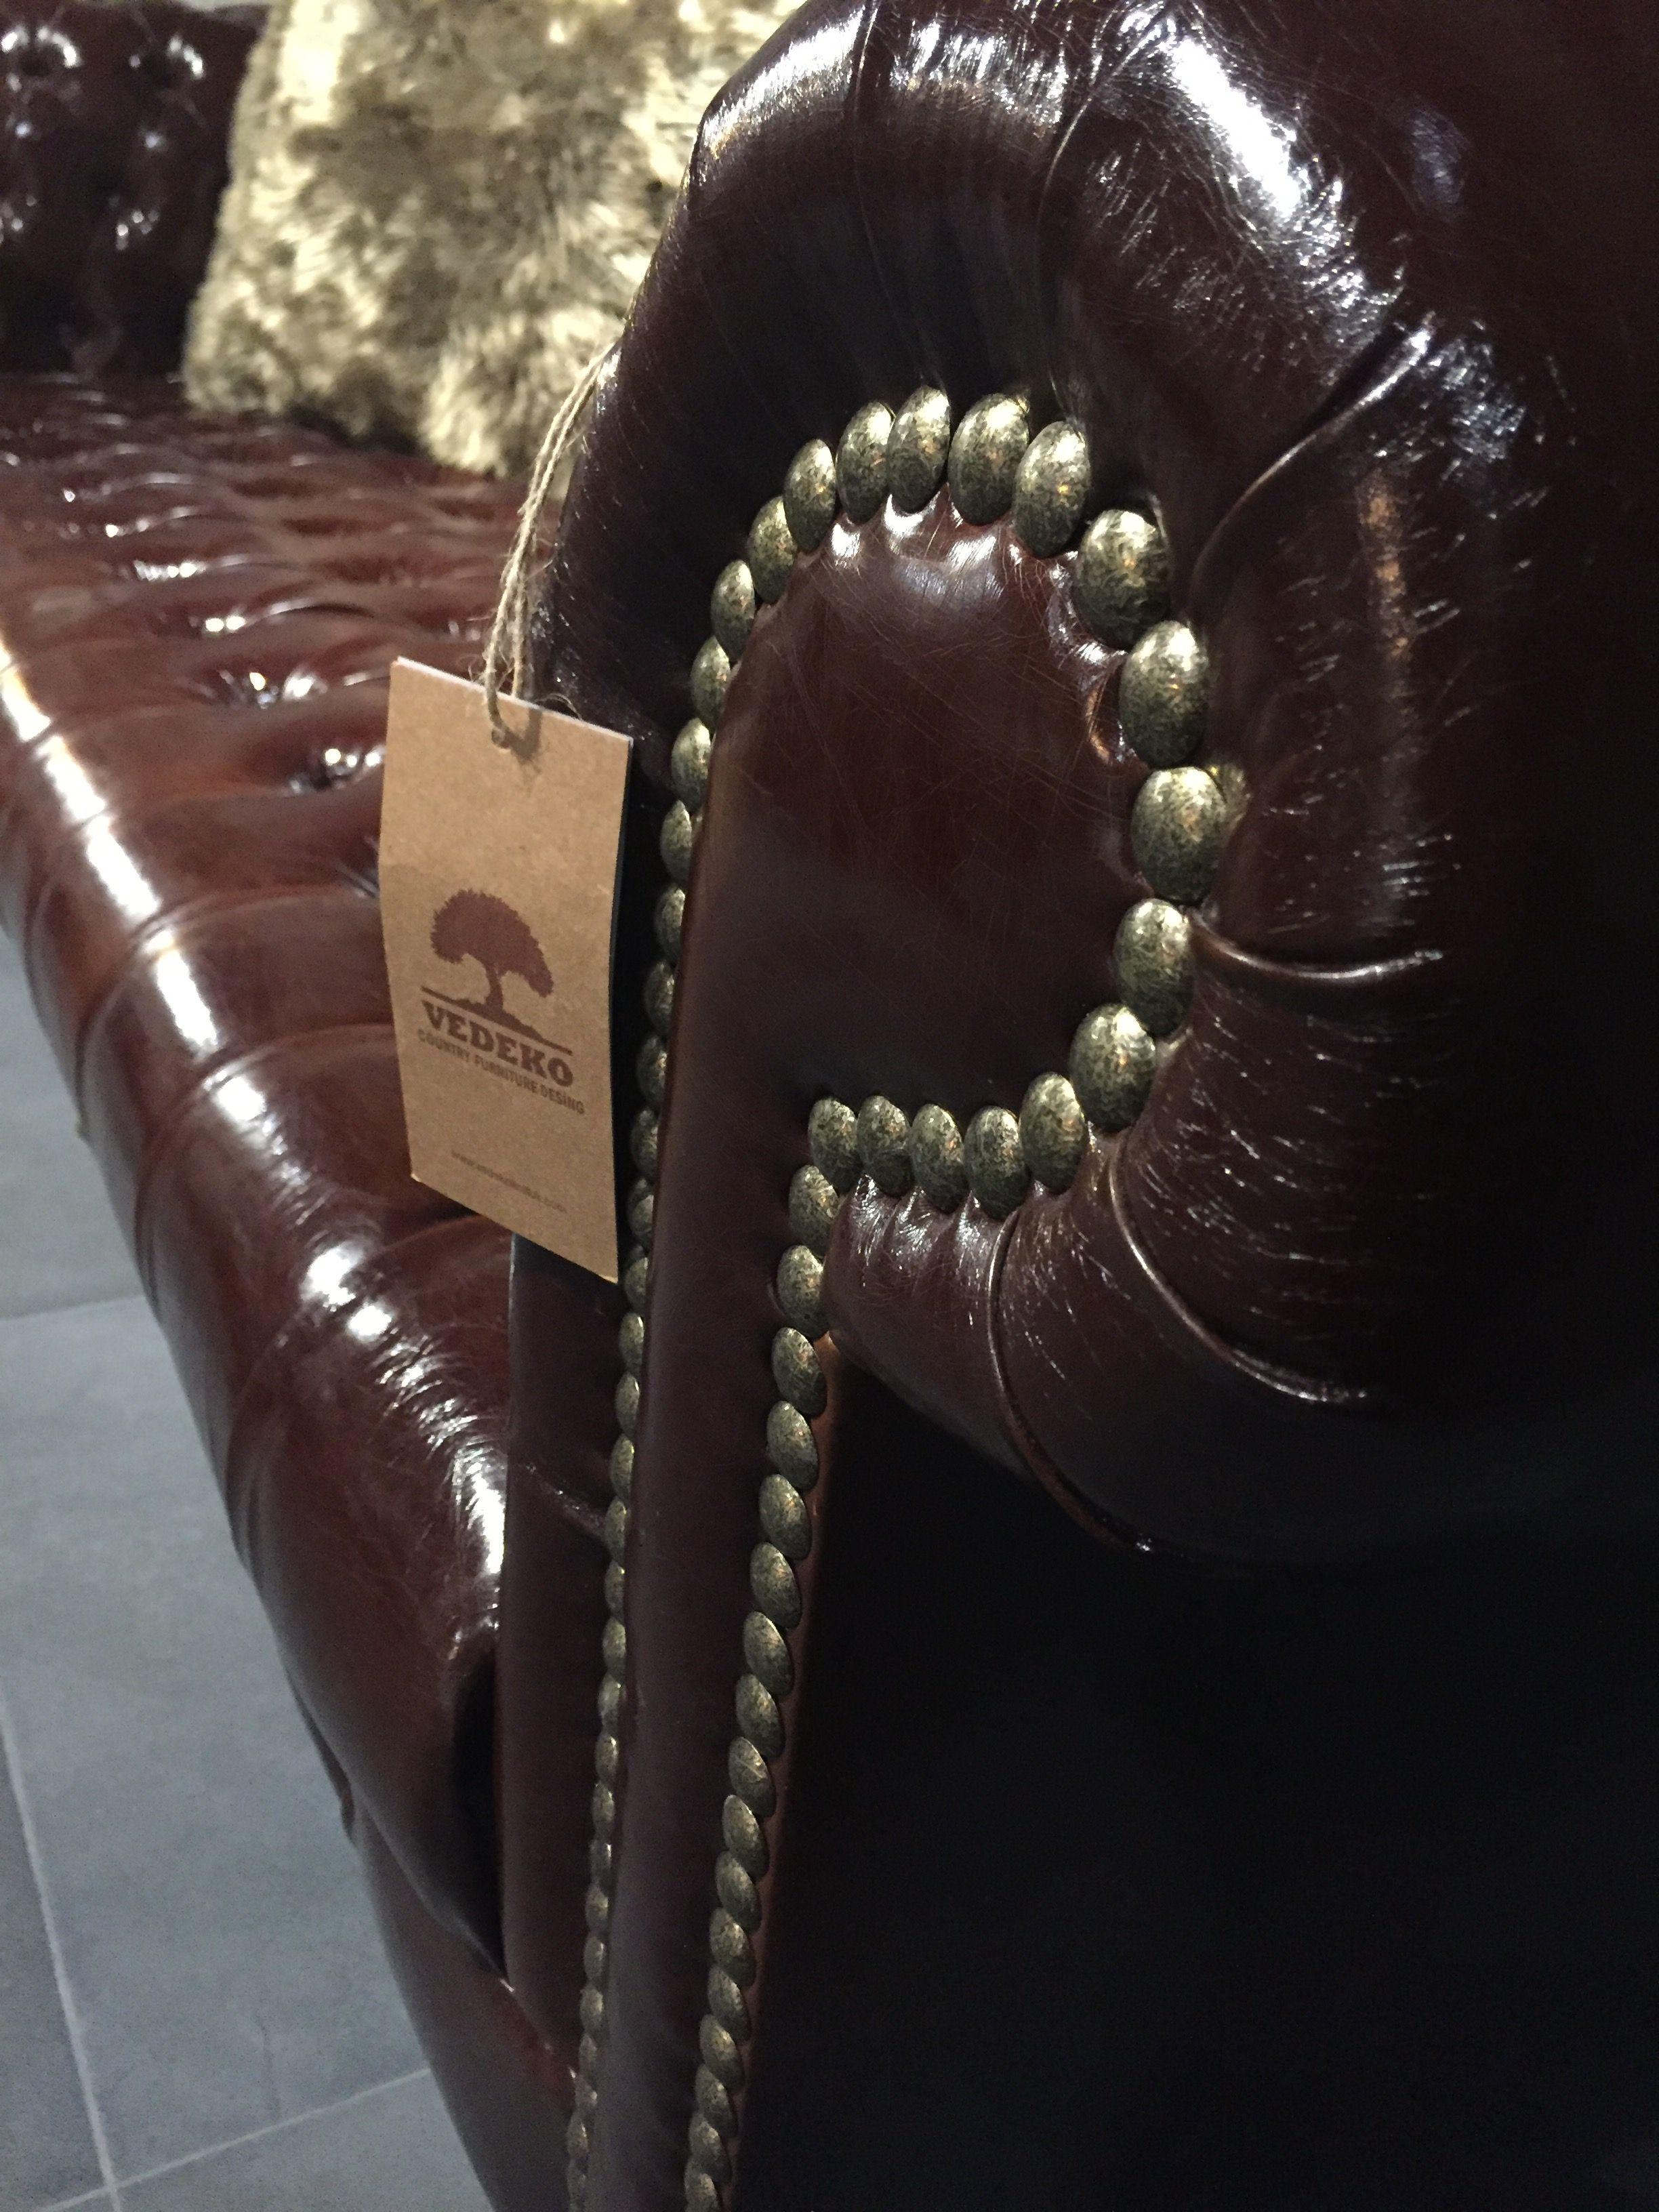 Chesterfield Chesterfieldsofa Icmimar Sofa Koltuk Kapitone Deri Ahsap Desing Wholesale Furniture Furnituredesign Imal Chesterfield Deri Dekorasyon